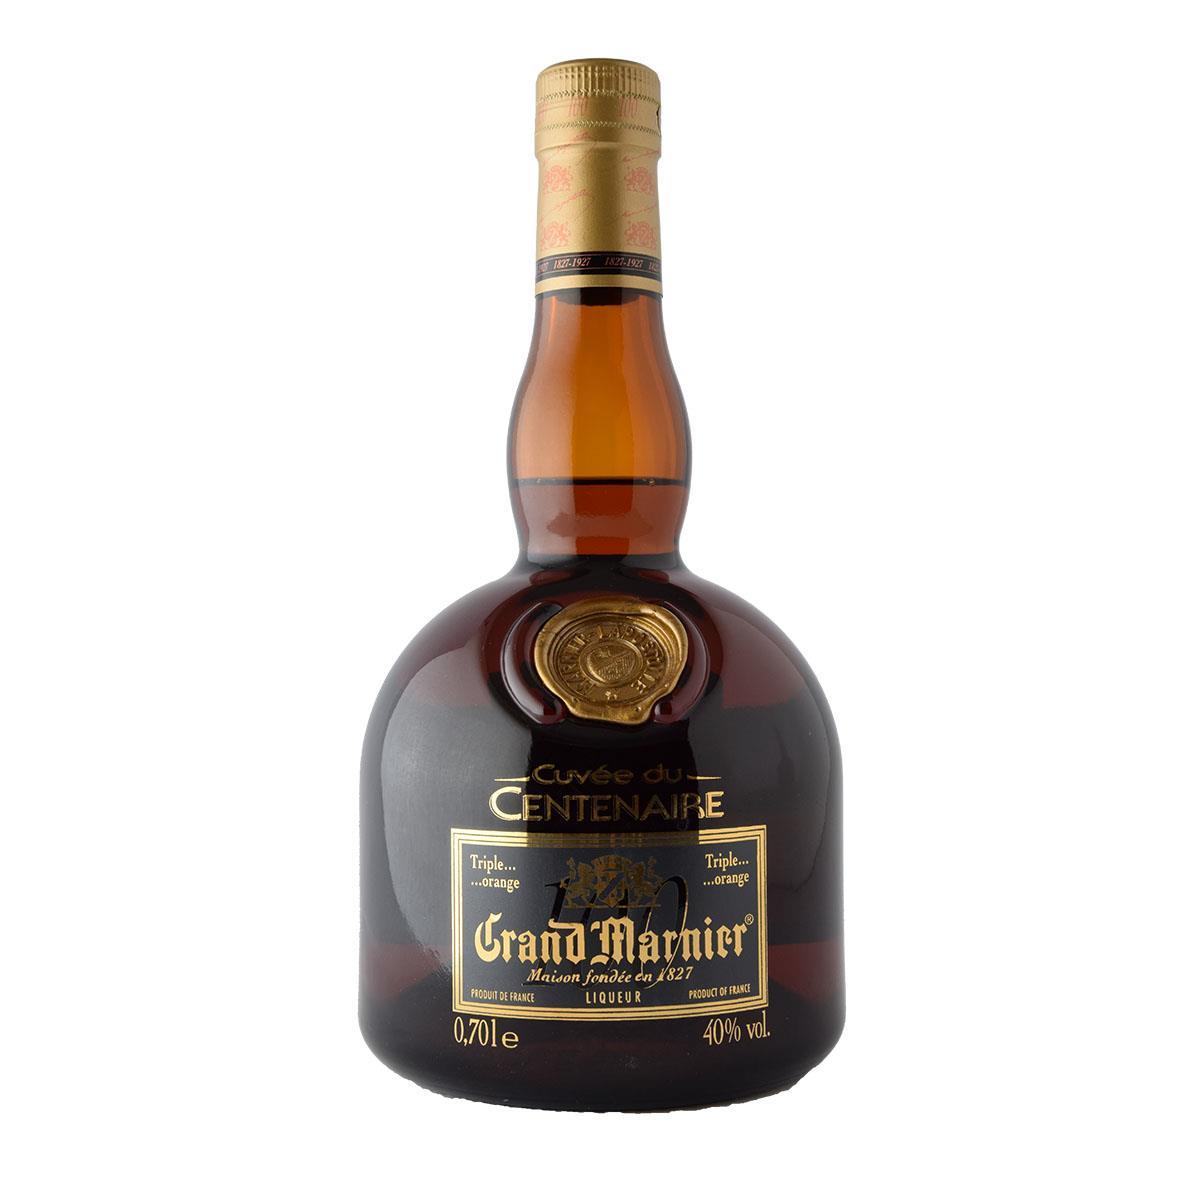 Grand Marnier Cuvee du Centenaire Liqueur 700ml